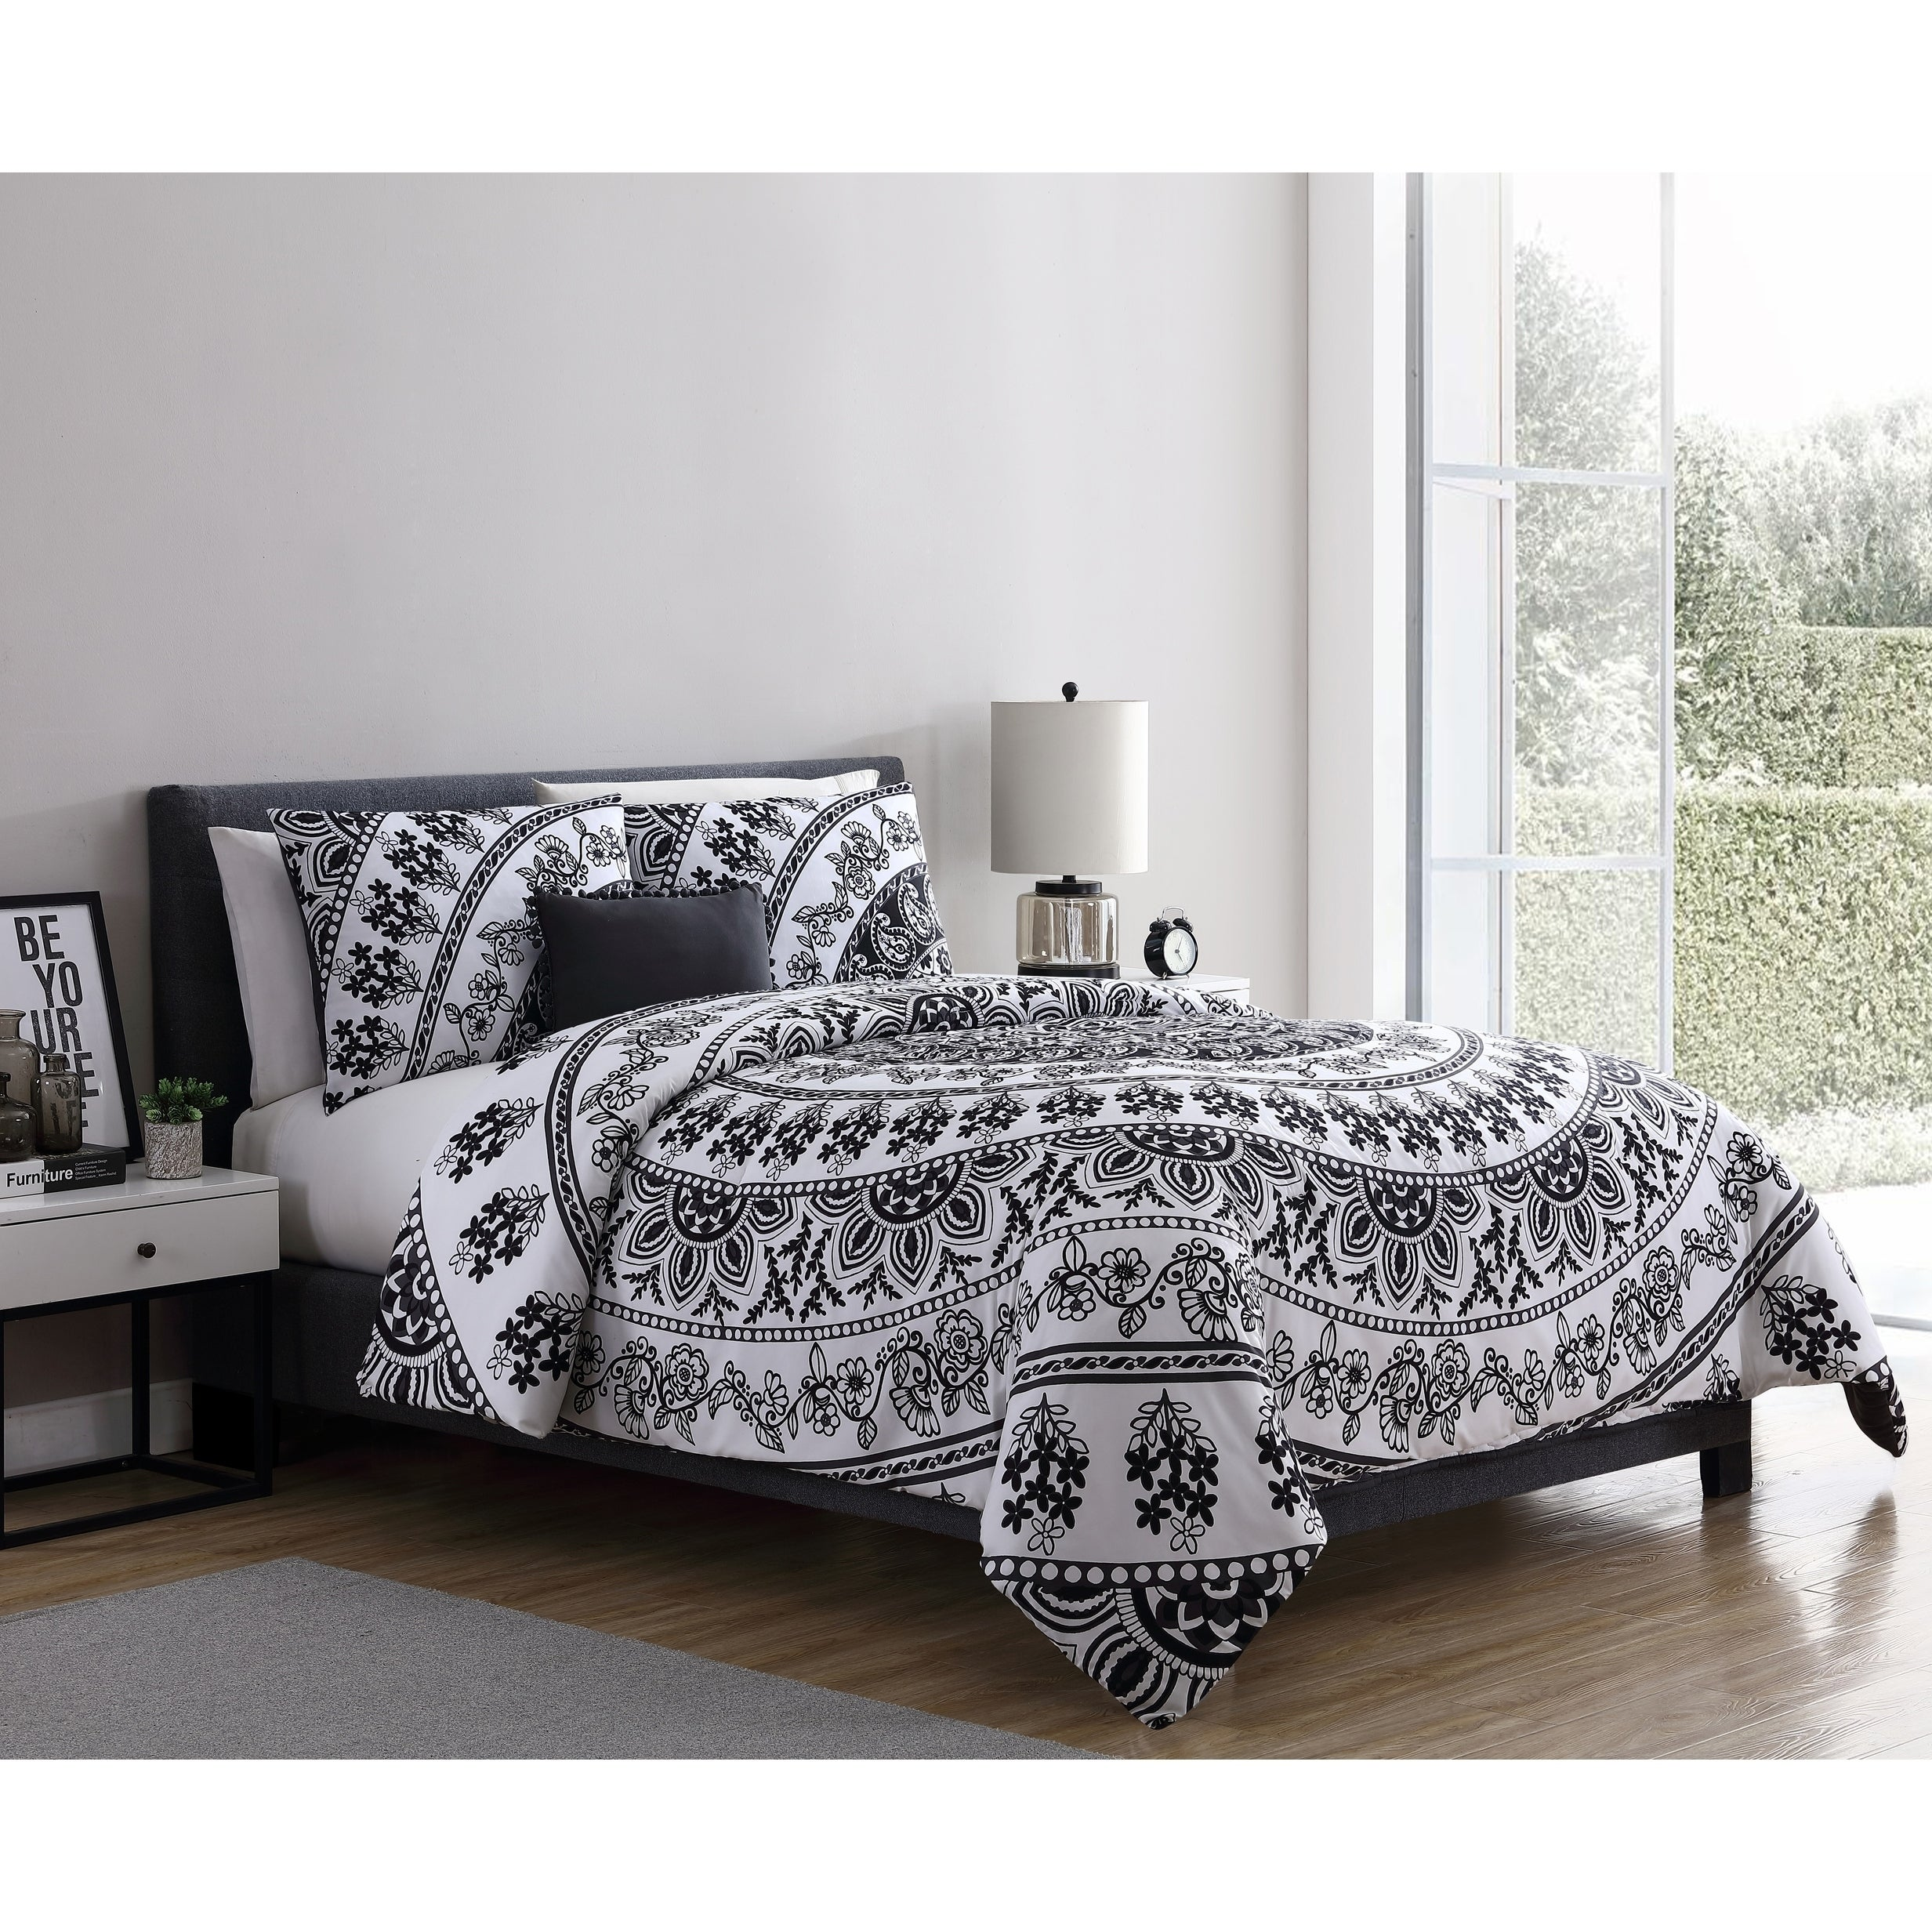 Shop Vcny Home Kaci Black White Medallion Comforter Set On Sale